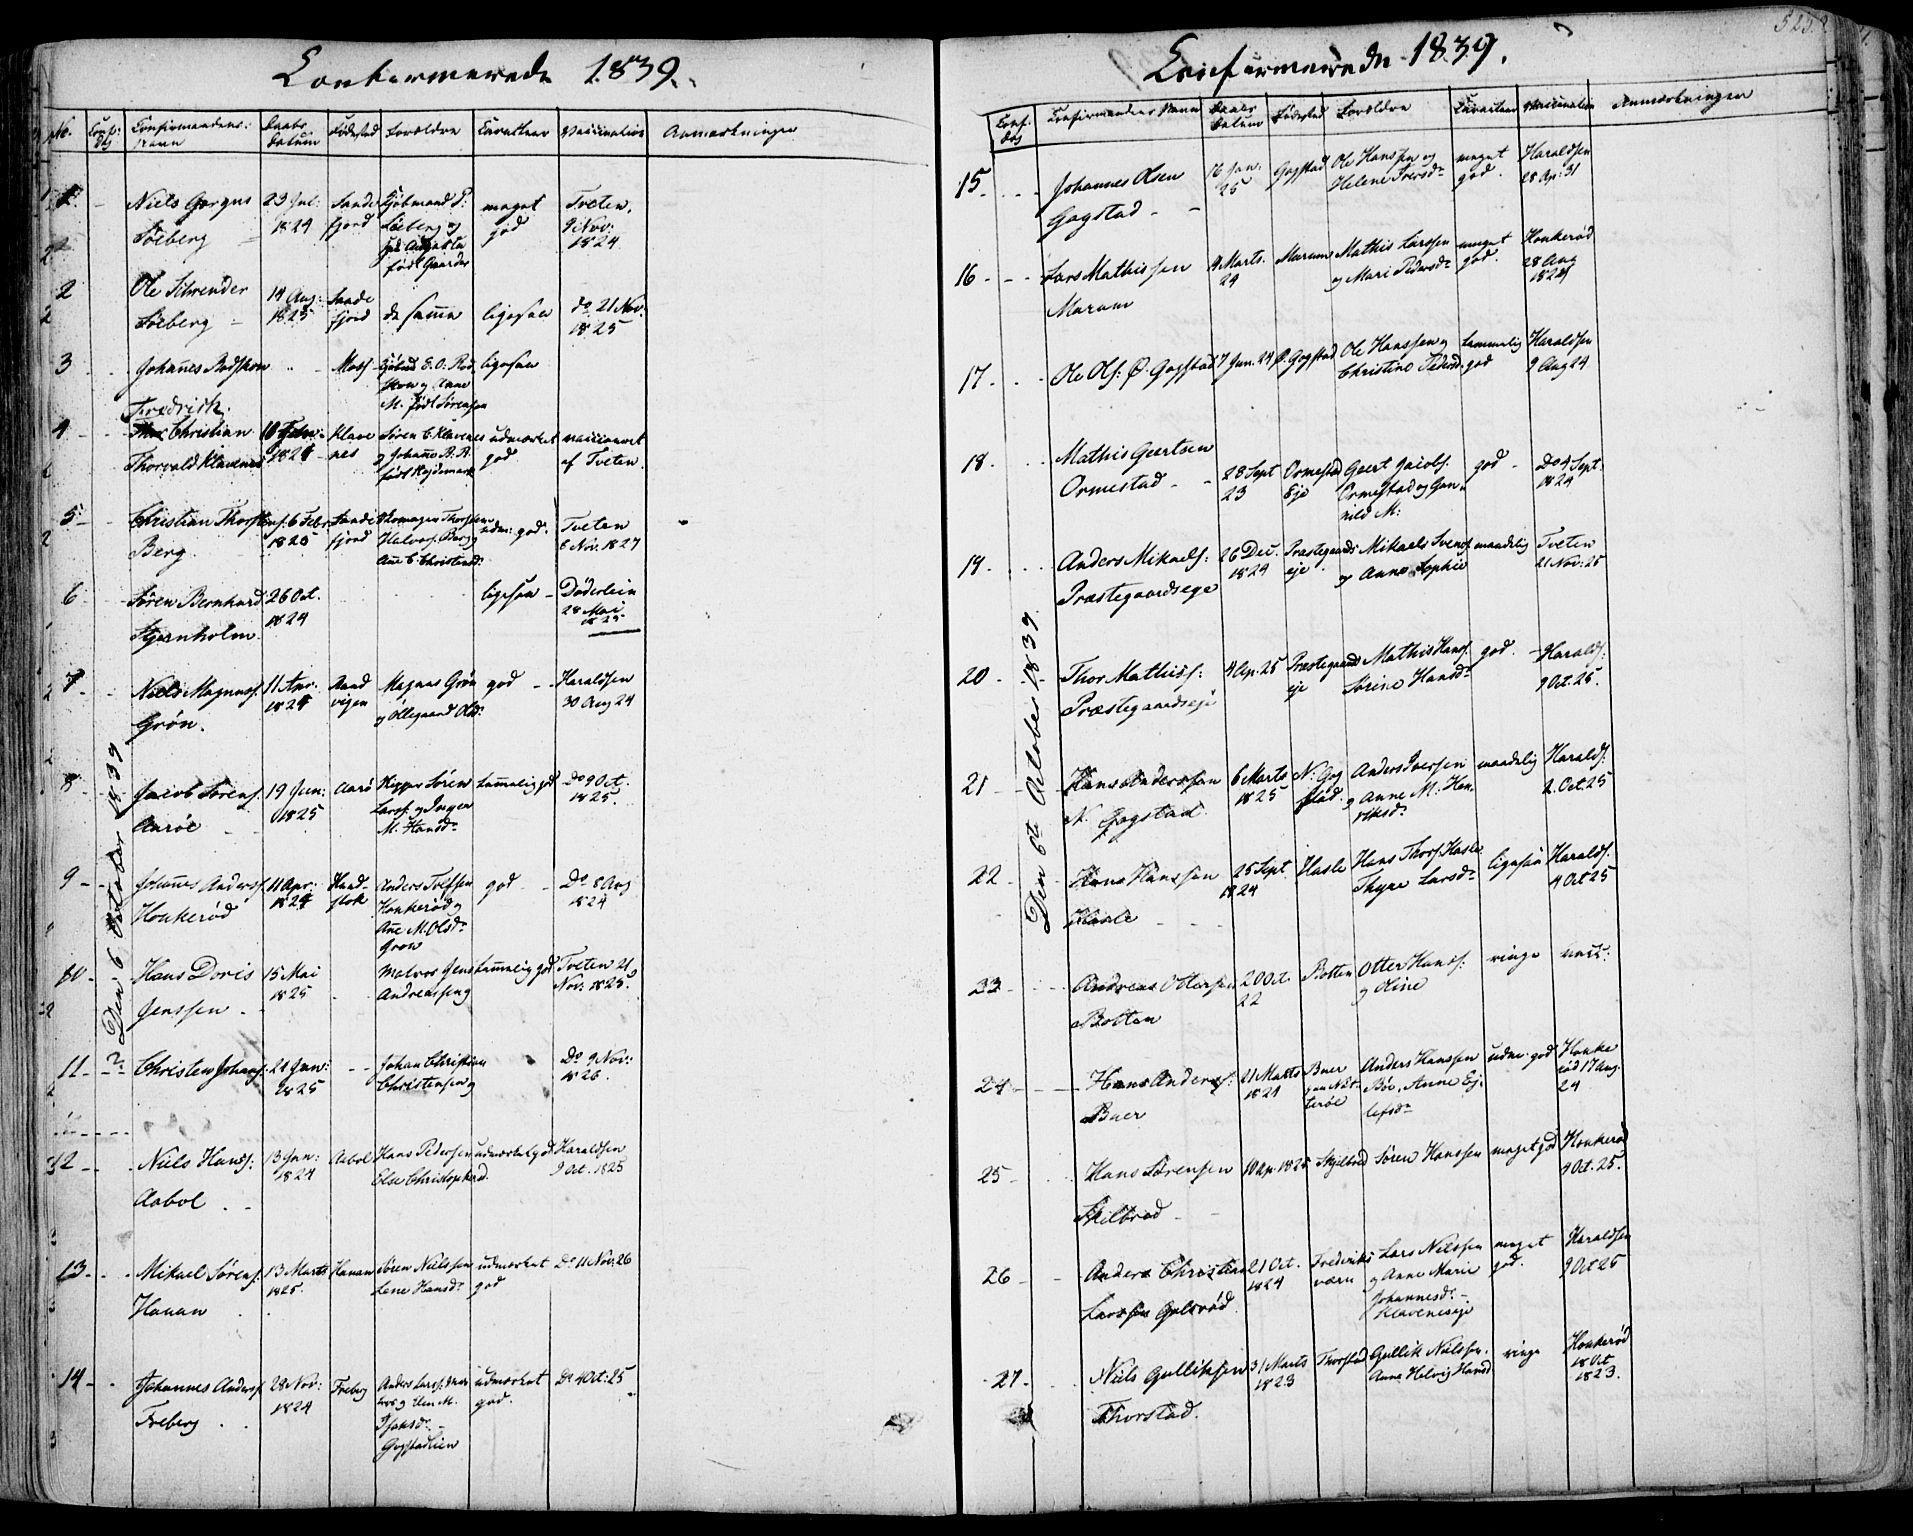 SAKO, Sandar kirkebøker, F/Fa/L0005: Parish register (official) no. 5, 1832-1847, p. 524-525